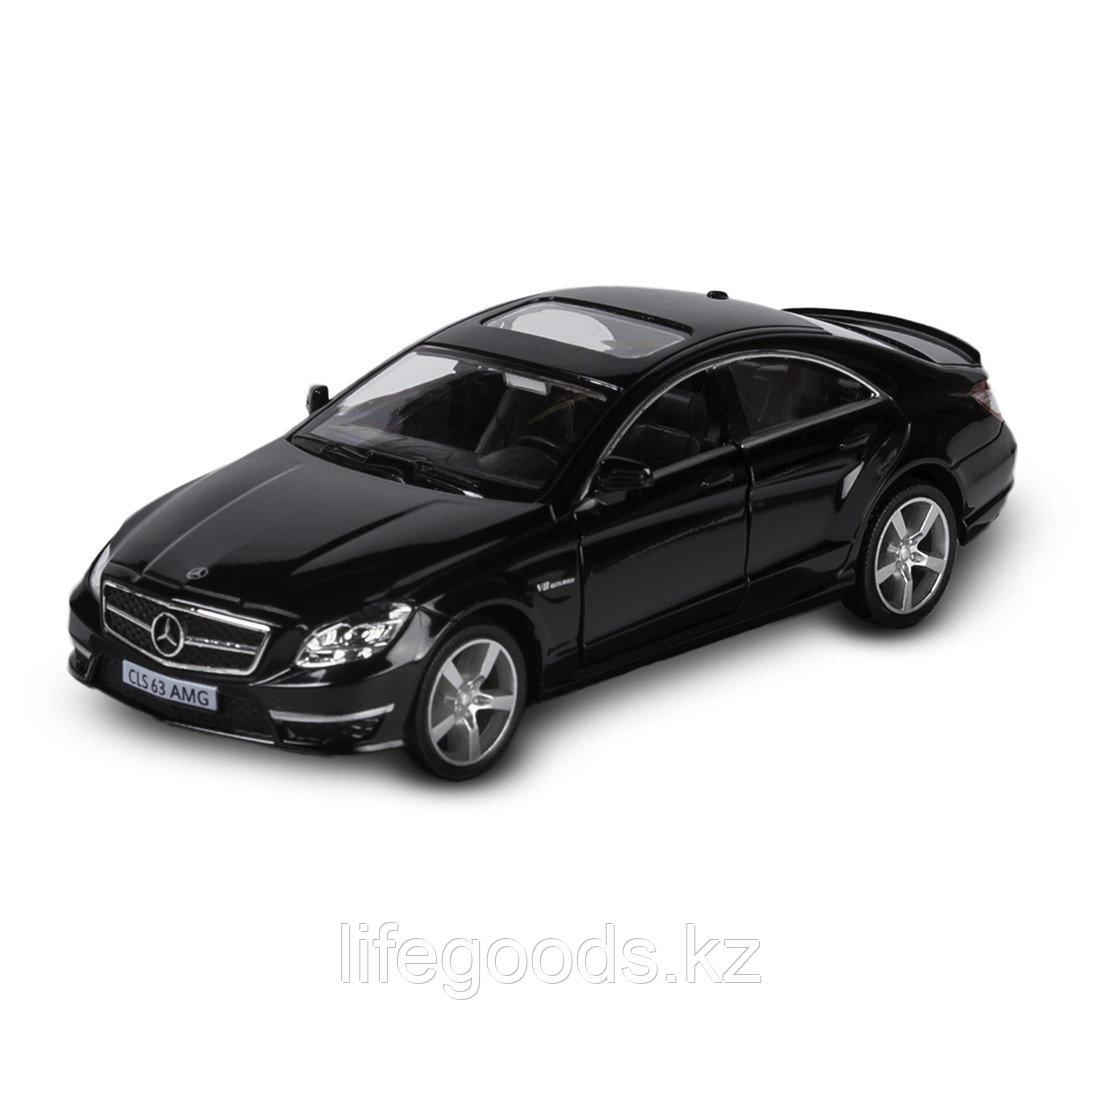 Металлическая машинка RASTAR 1:43 Mercedes-Benz CL 63 AMG 34300B